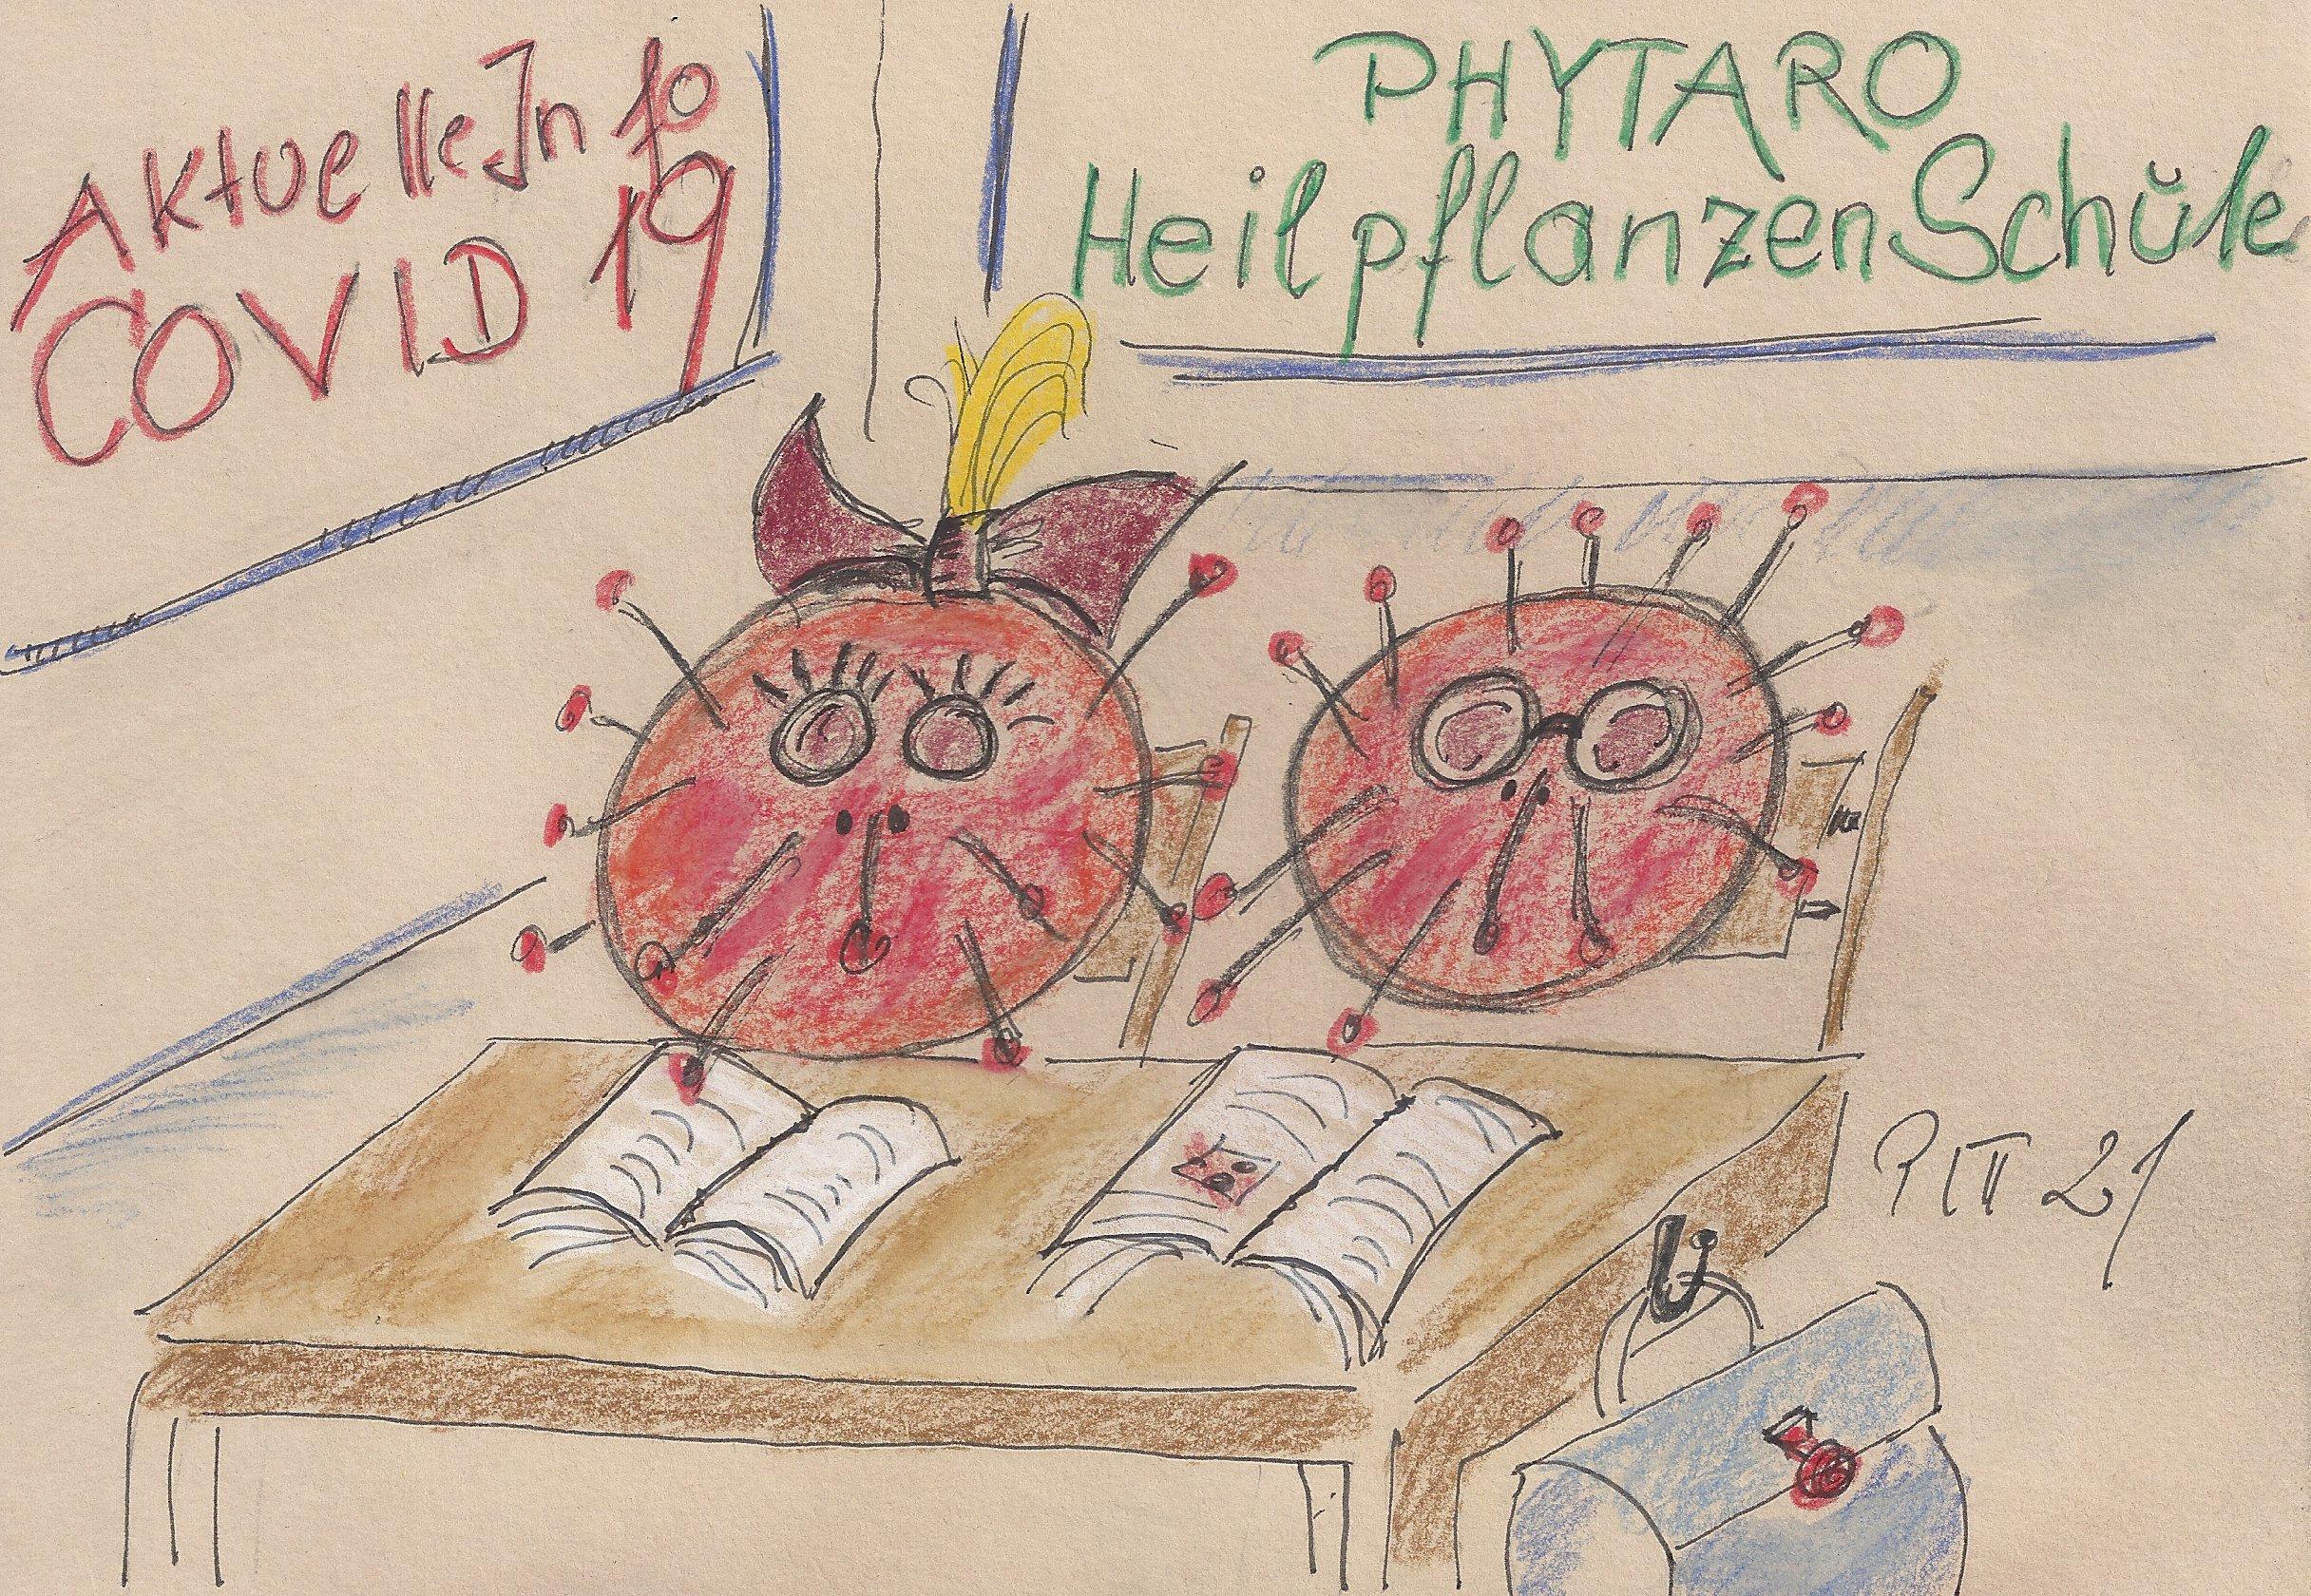 Phytaro_Corona